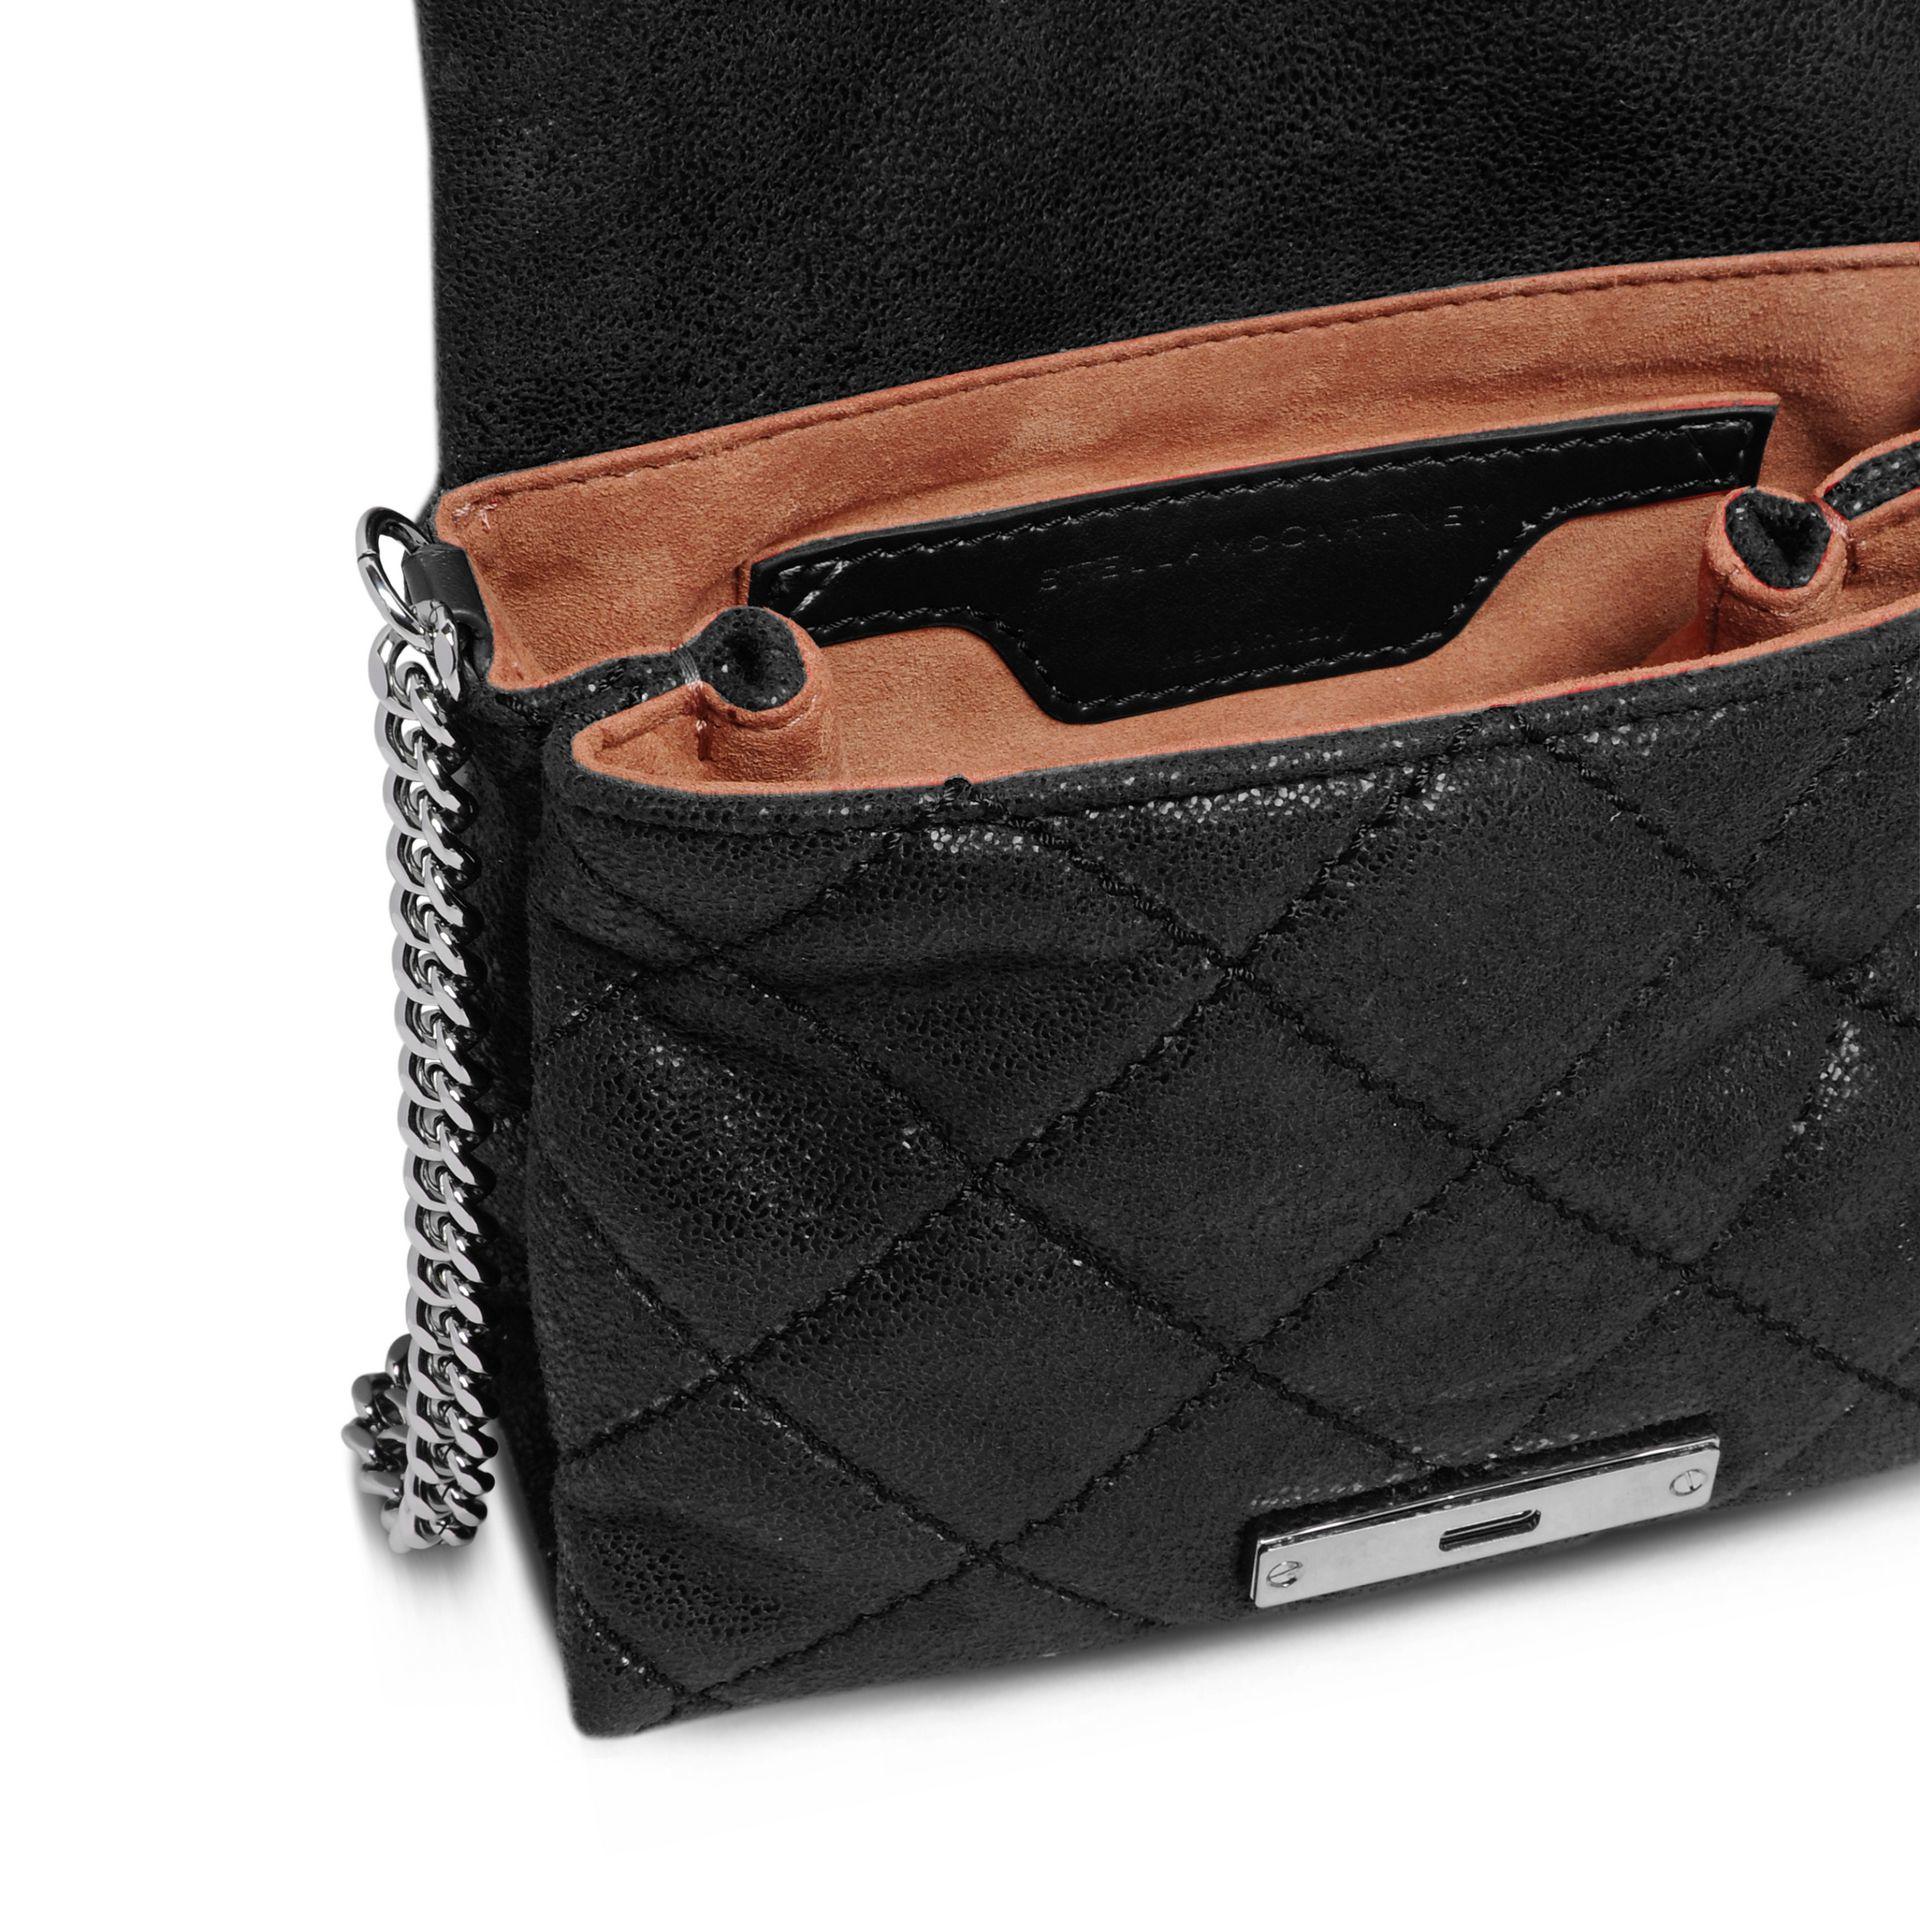 d96e05fee0 Lyst - Stella McCartney Black Becks Mini Shoulder Bag in Black